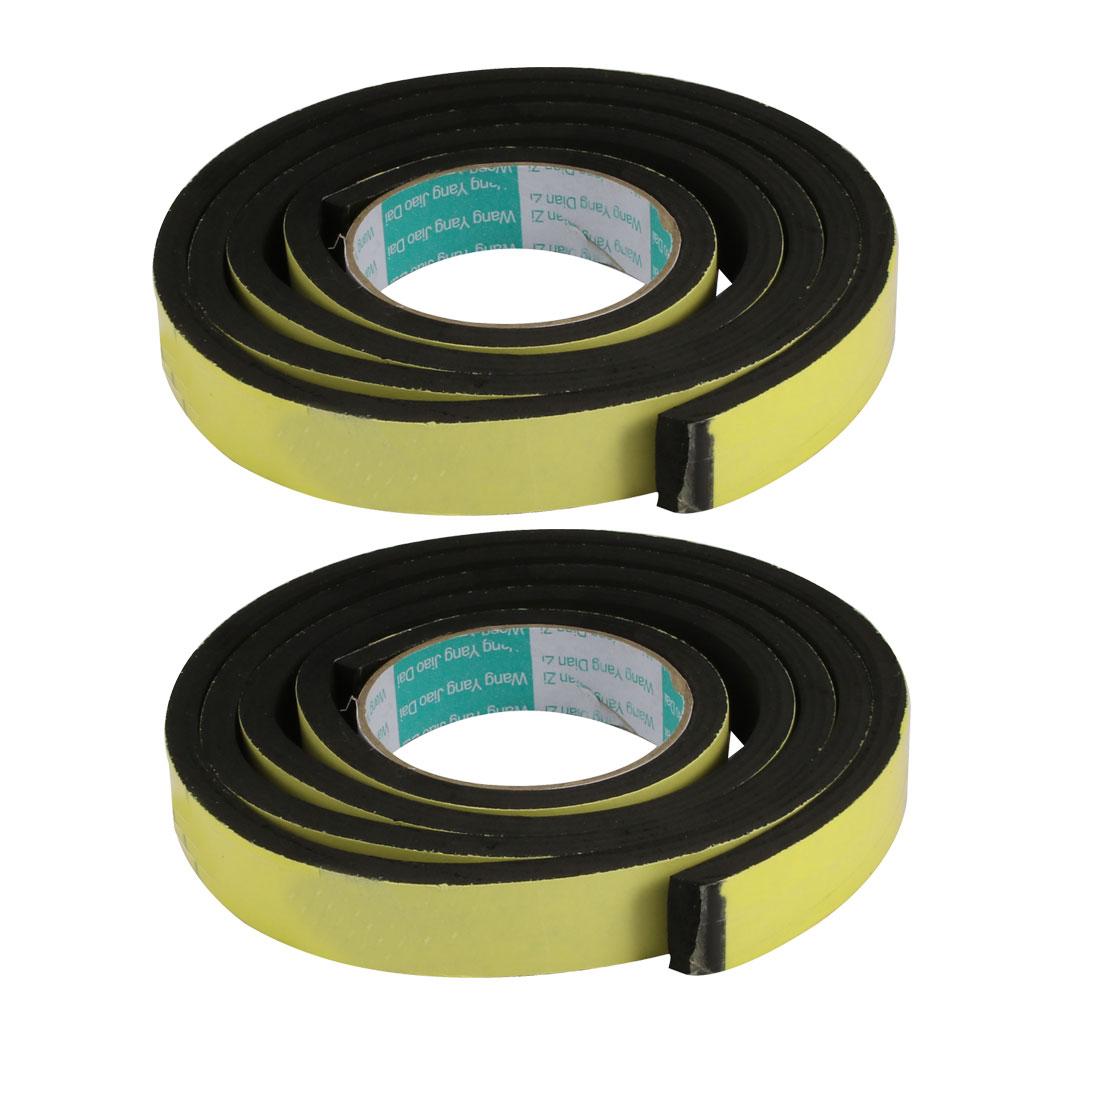 2pcs 25mm Wide 8mm Thick Single Sided Shockproof EVA Sponge Tape Black 2M Long